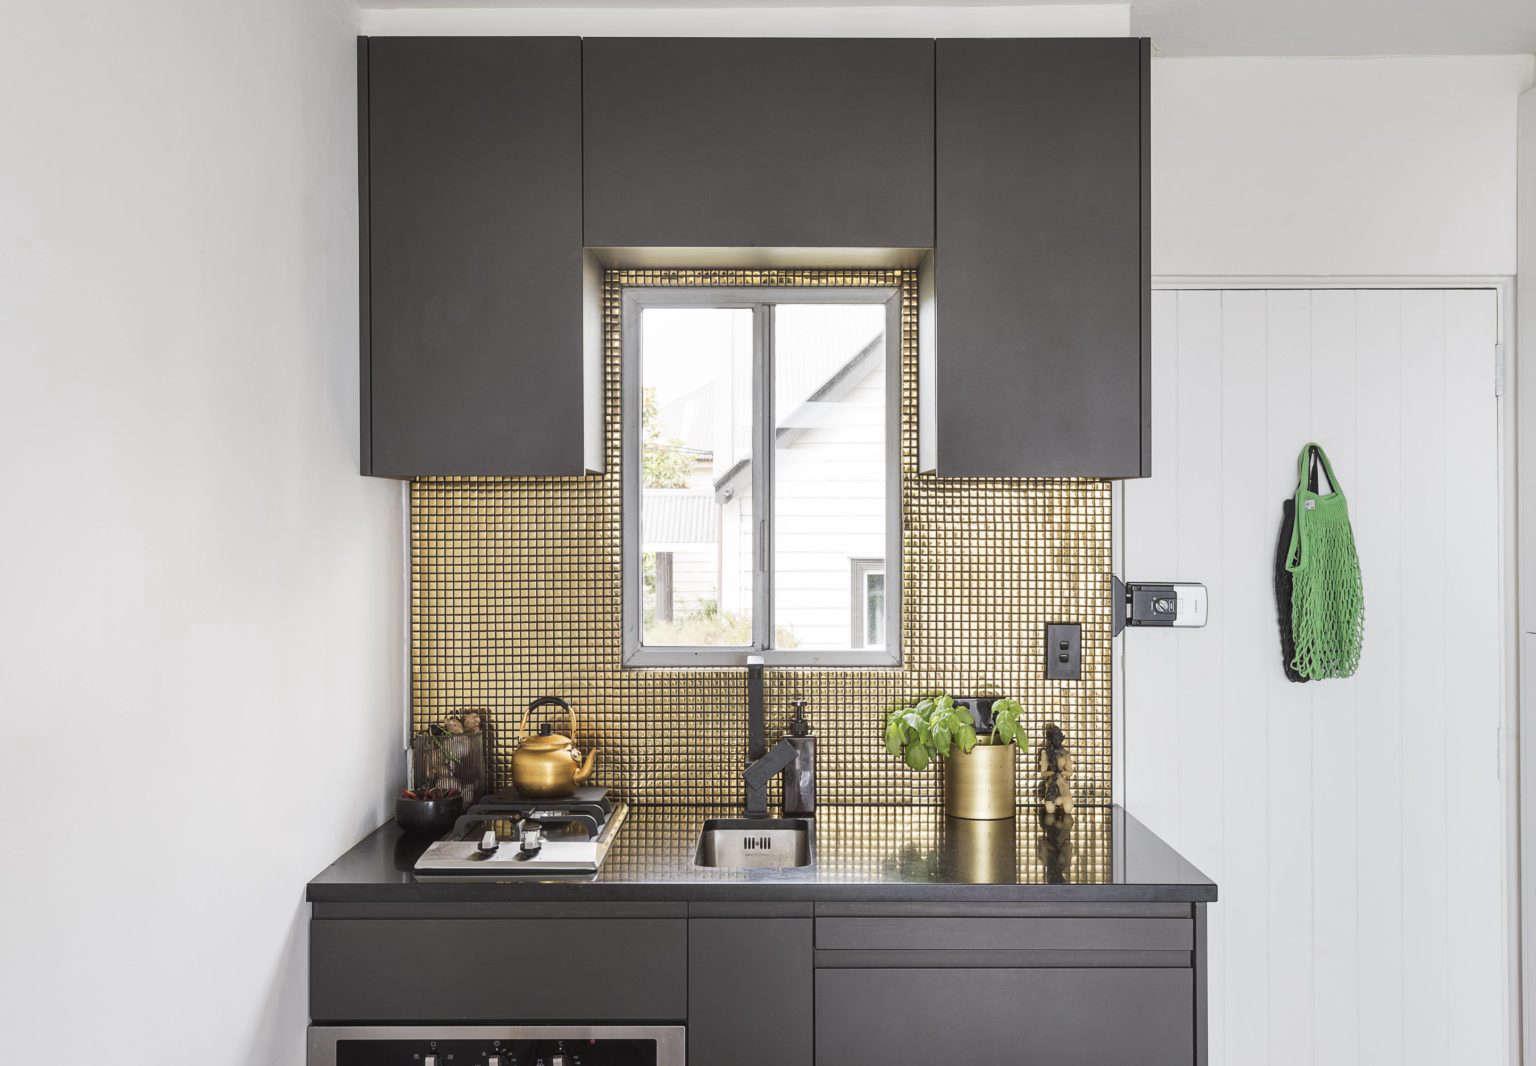 karin montgomery spath new zealand studio kitchen matthew williams